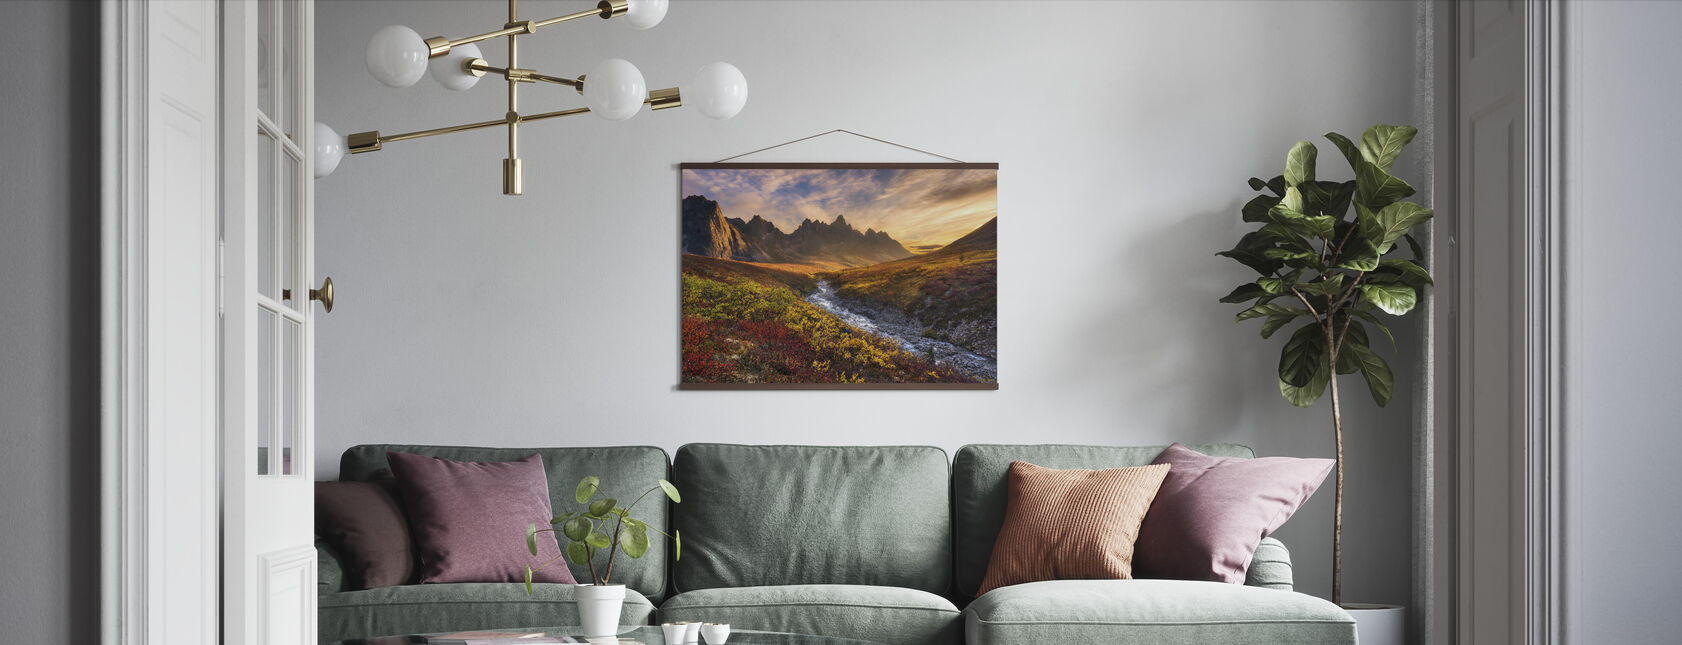 Bjerg Paradise - Plakat - Stue